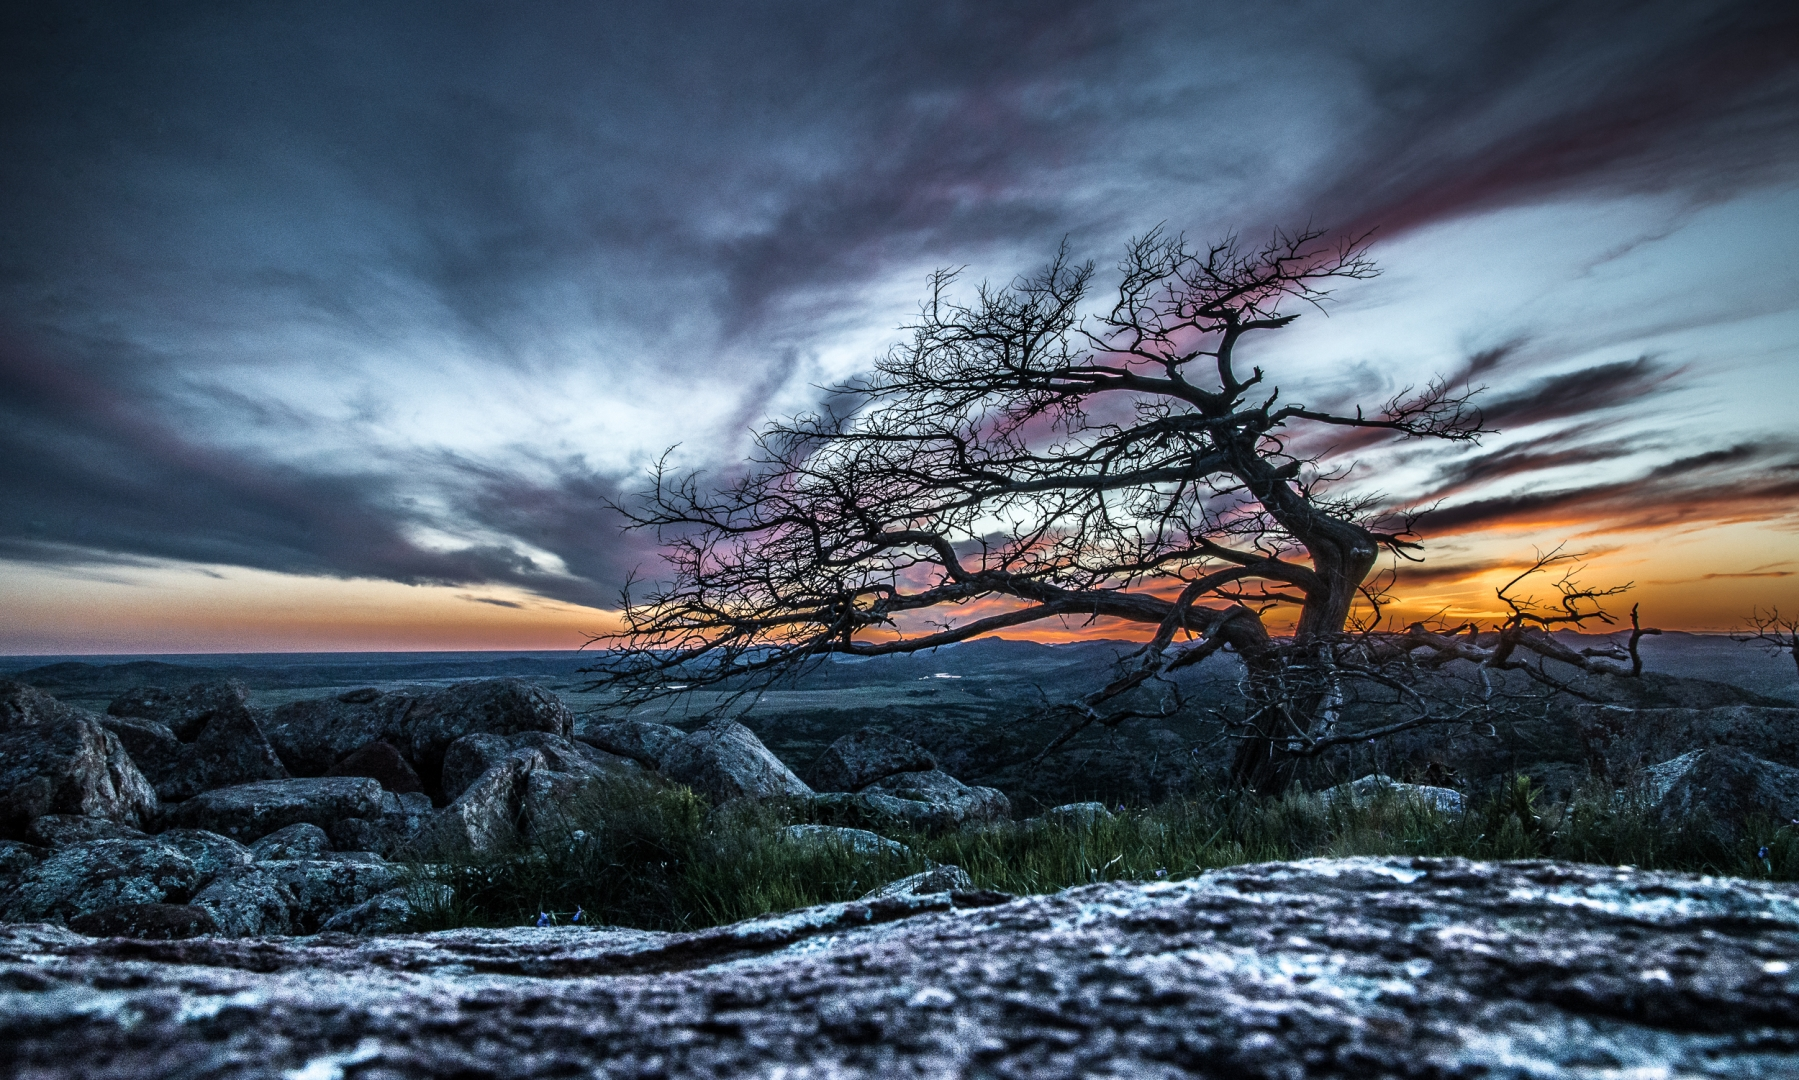 landscape tree cold winter sunset rocks texture